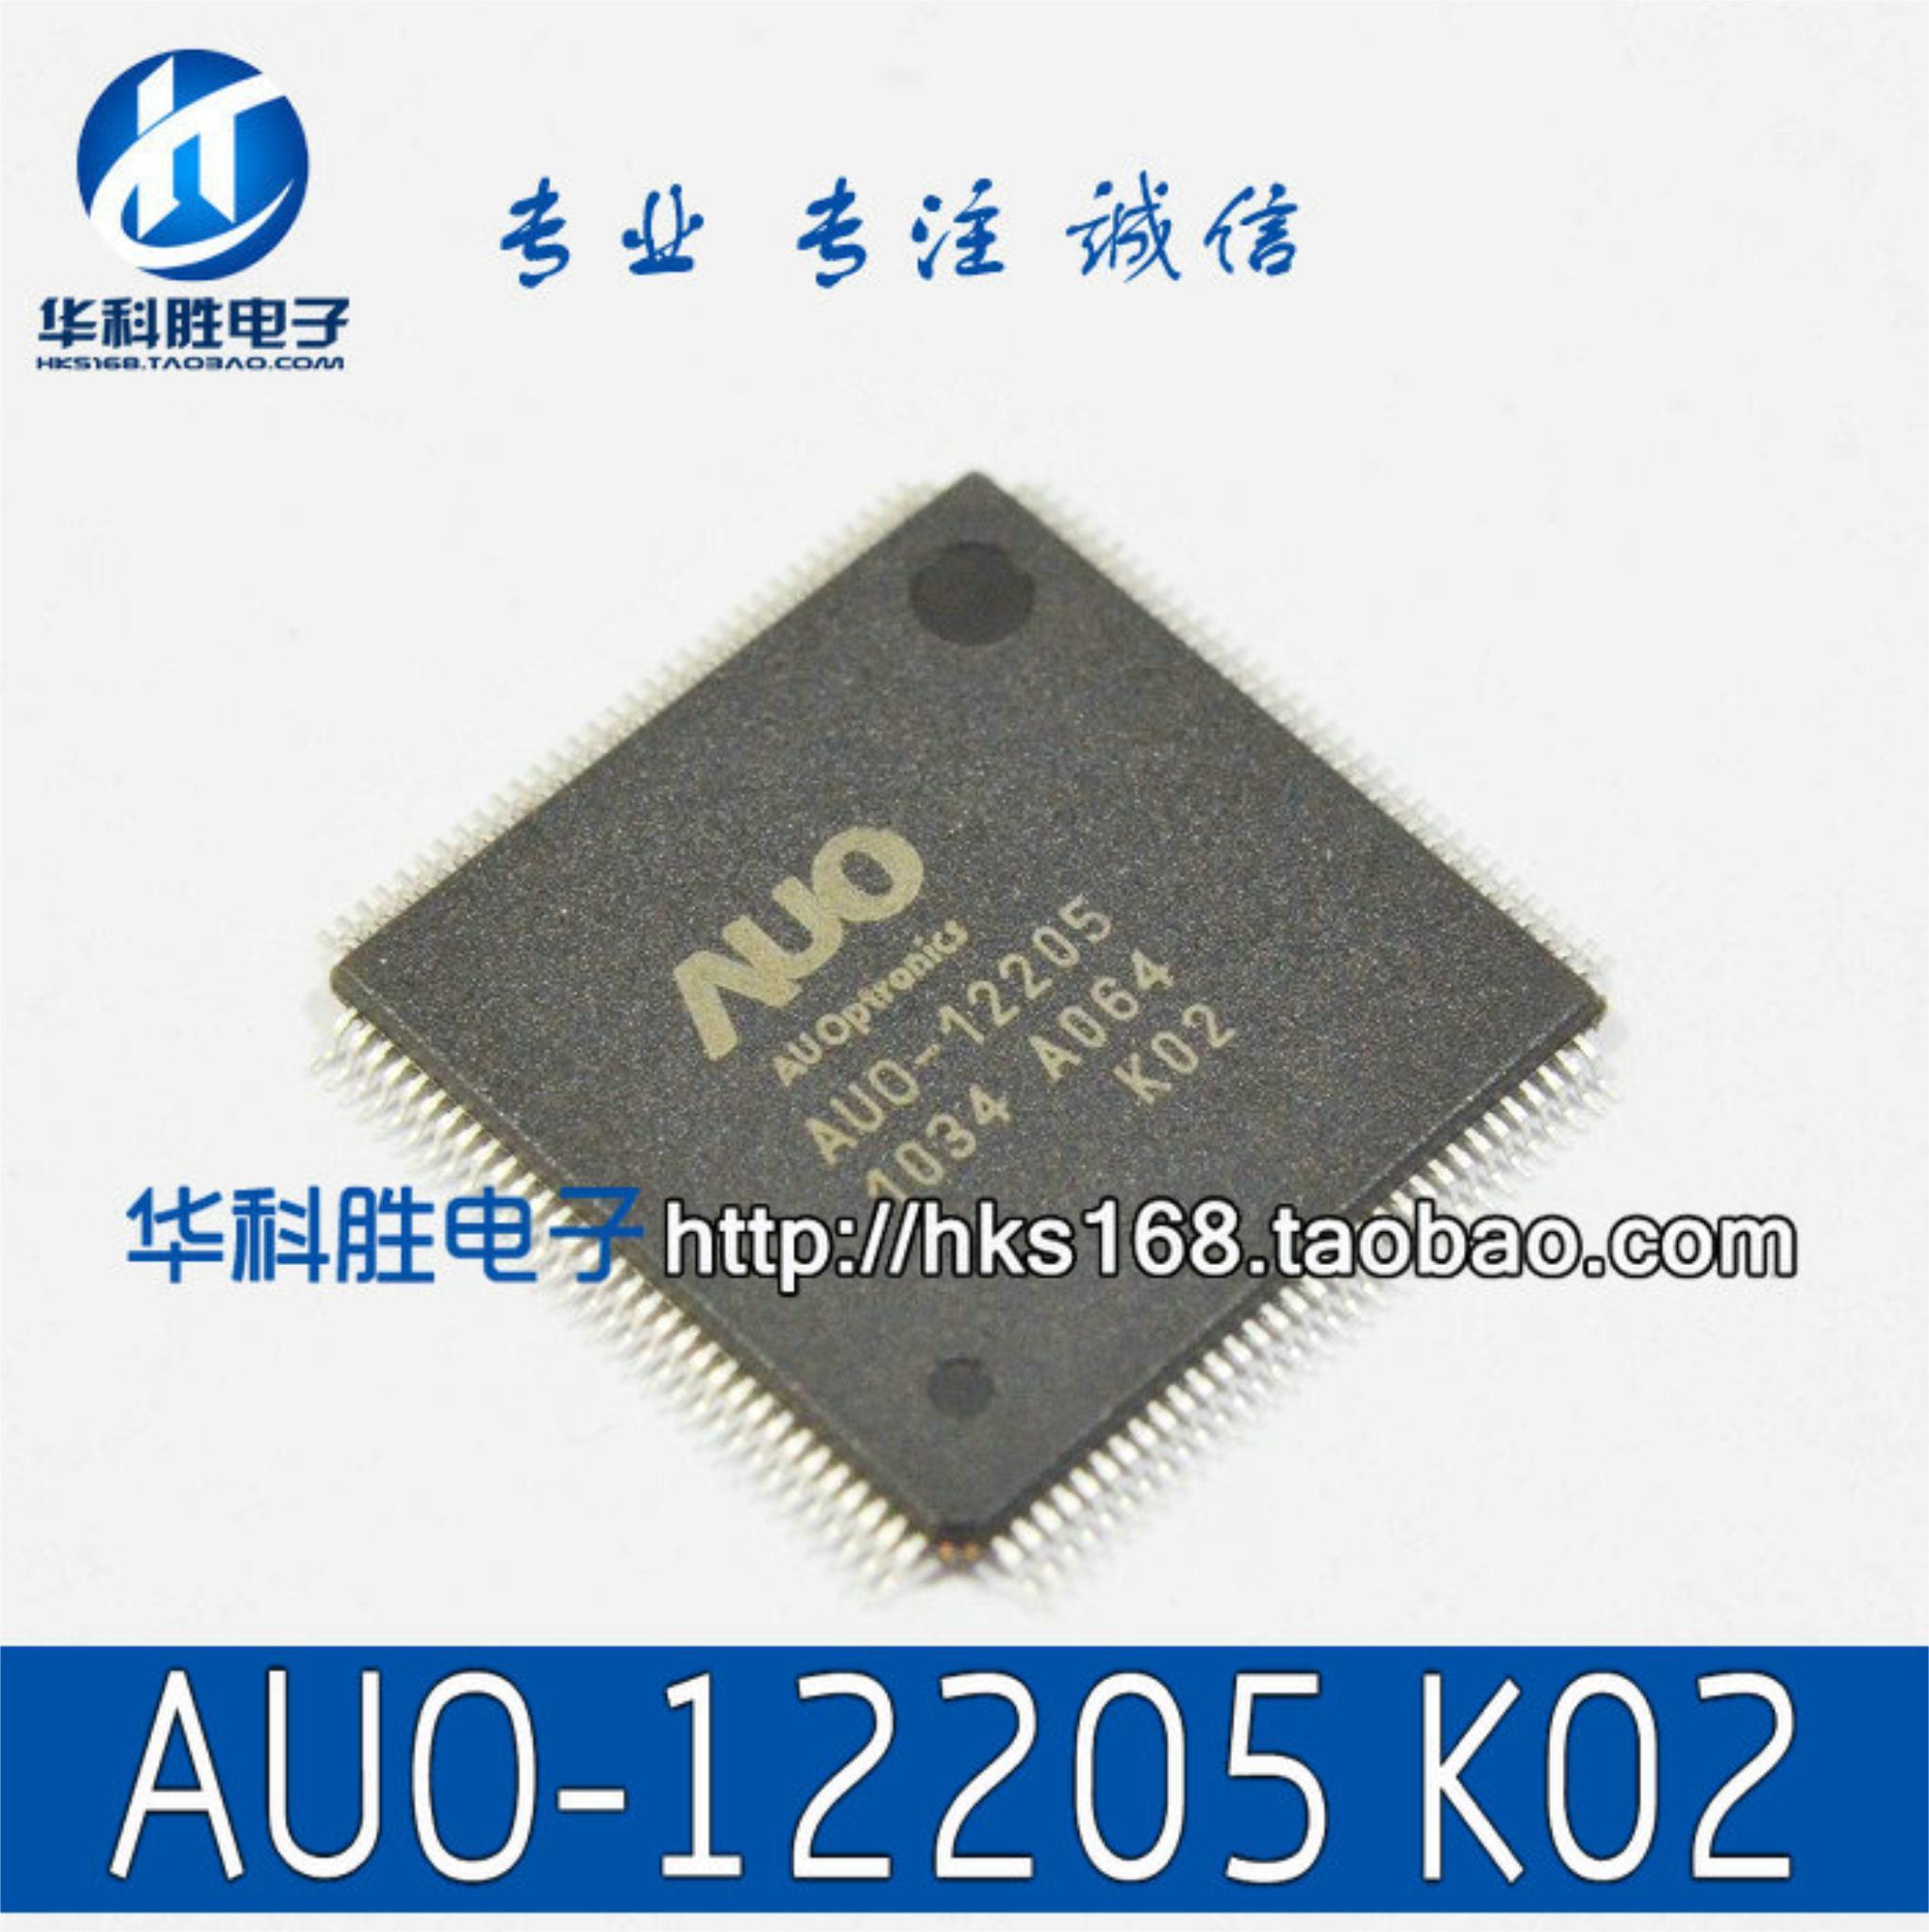 AUO-12205 new K02 LCD logic board chips--HKSYJ(China (Mainland))